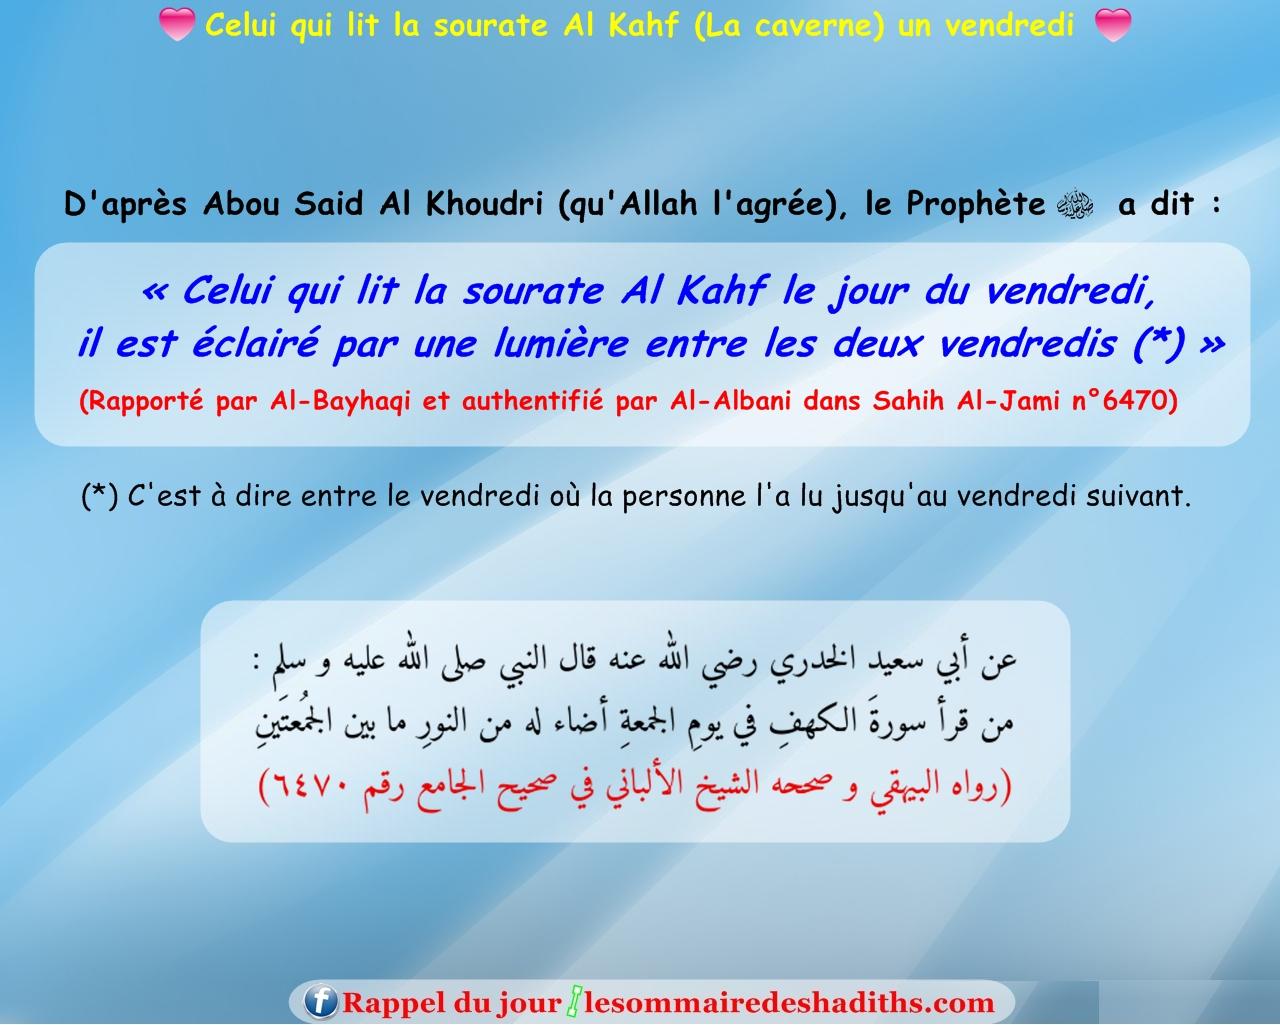 Celui qui lit la sourate Al Kahf un vendredi (Abu Sa'id Al-Khudri)